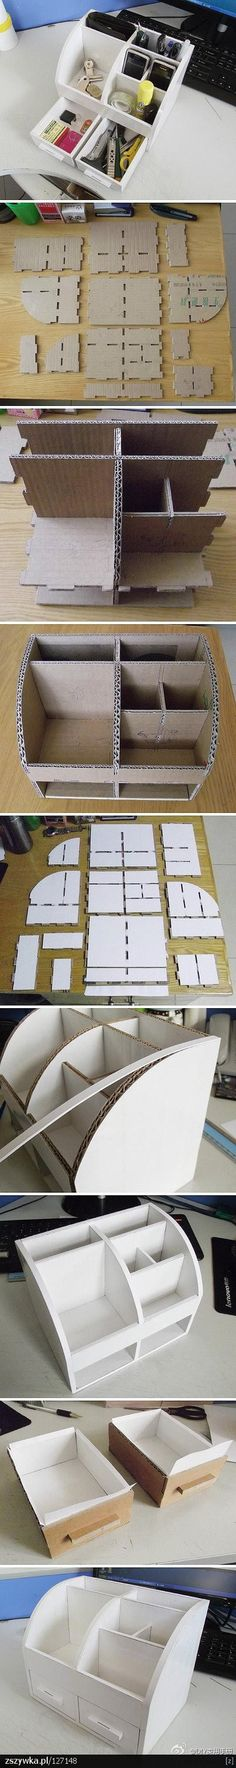 Office organizer from cardboard